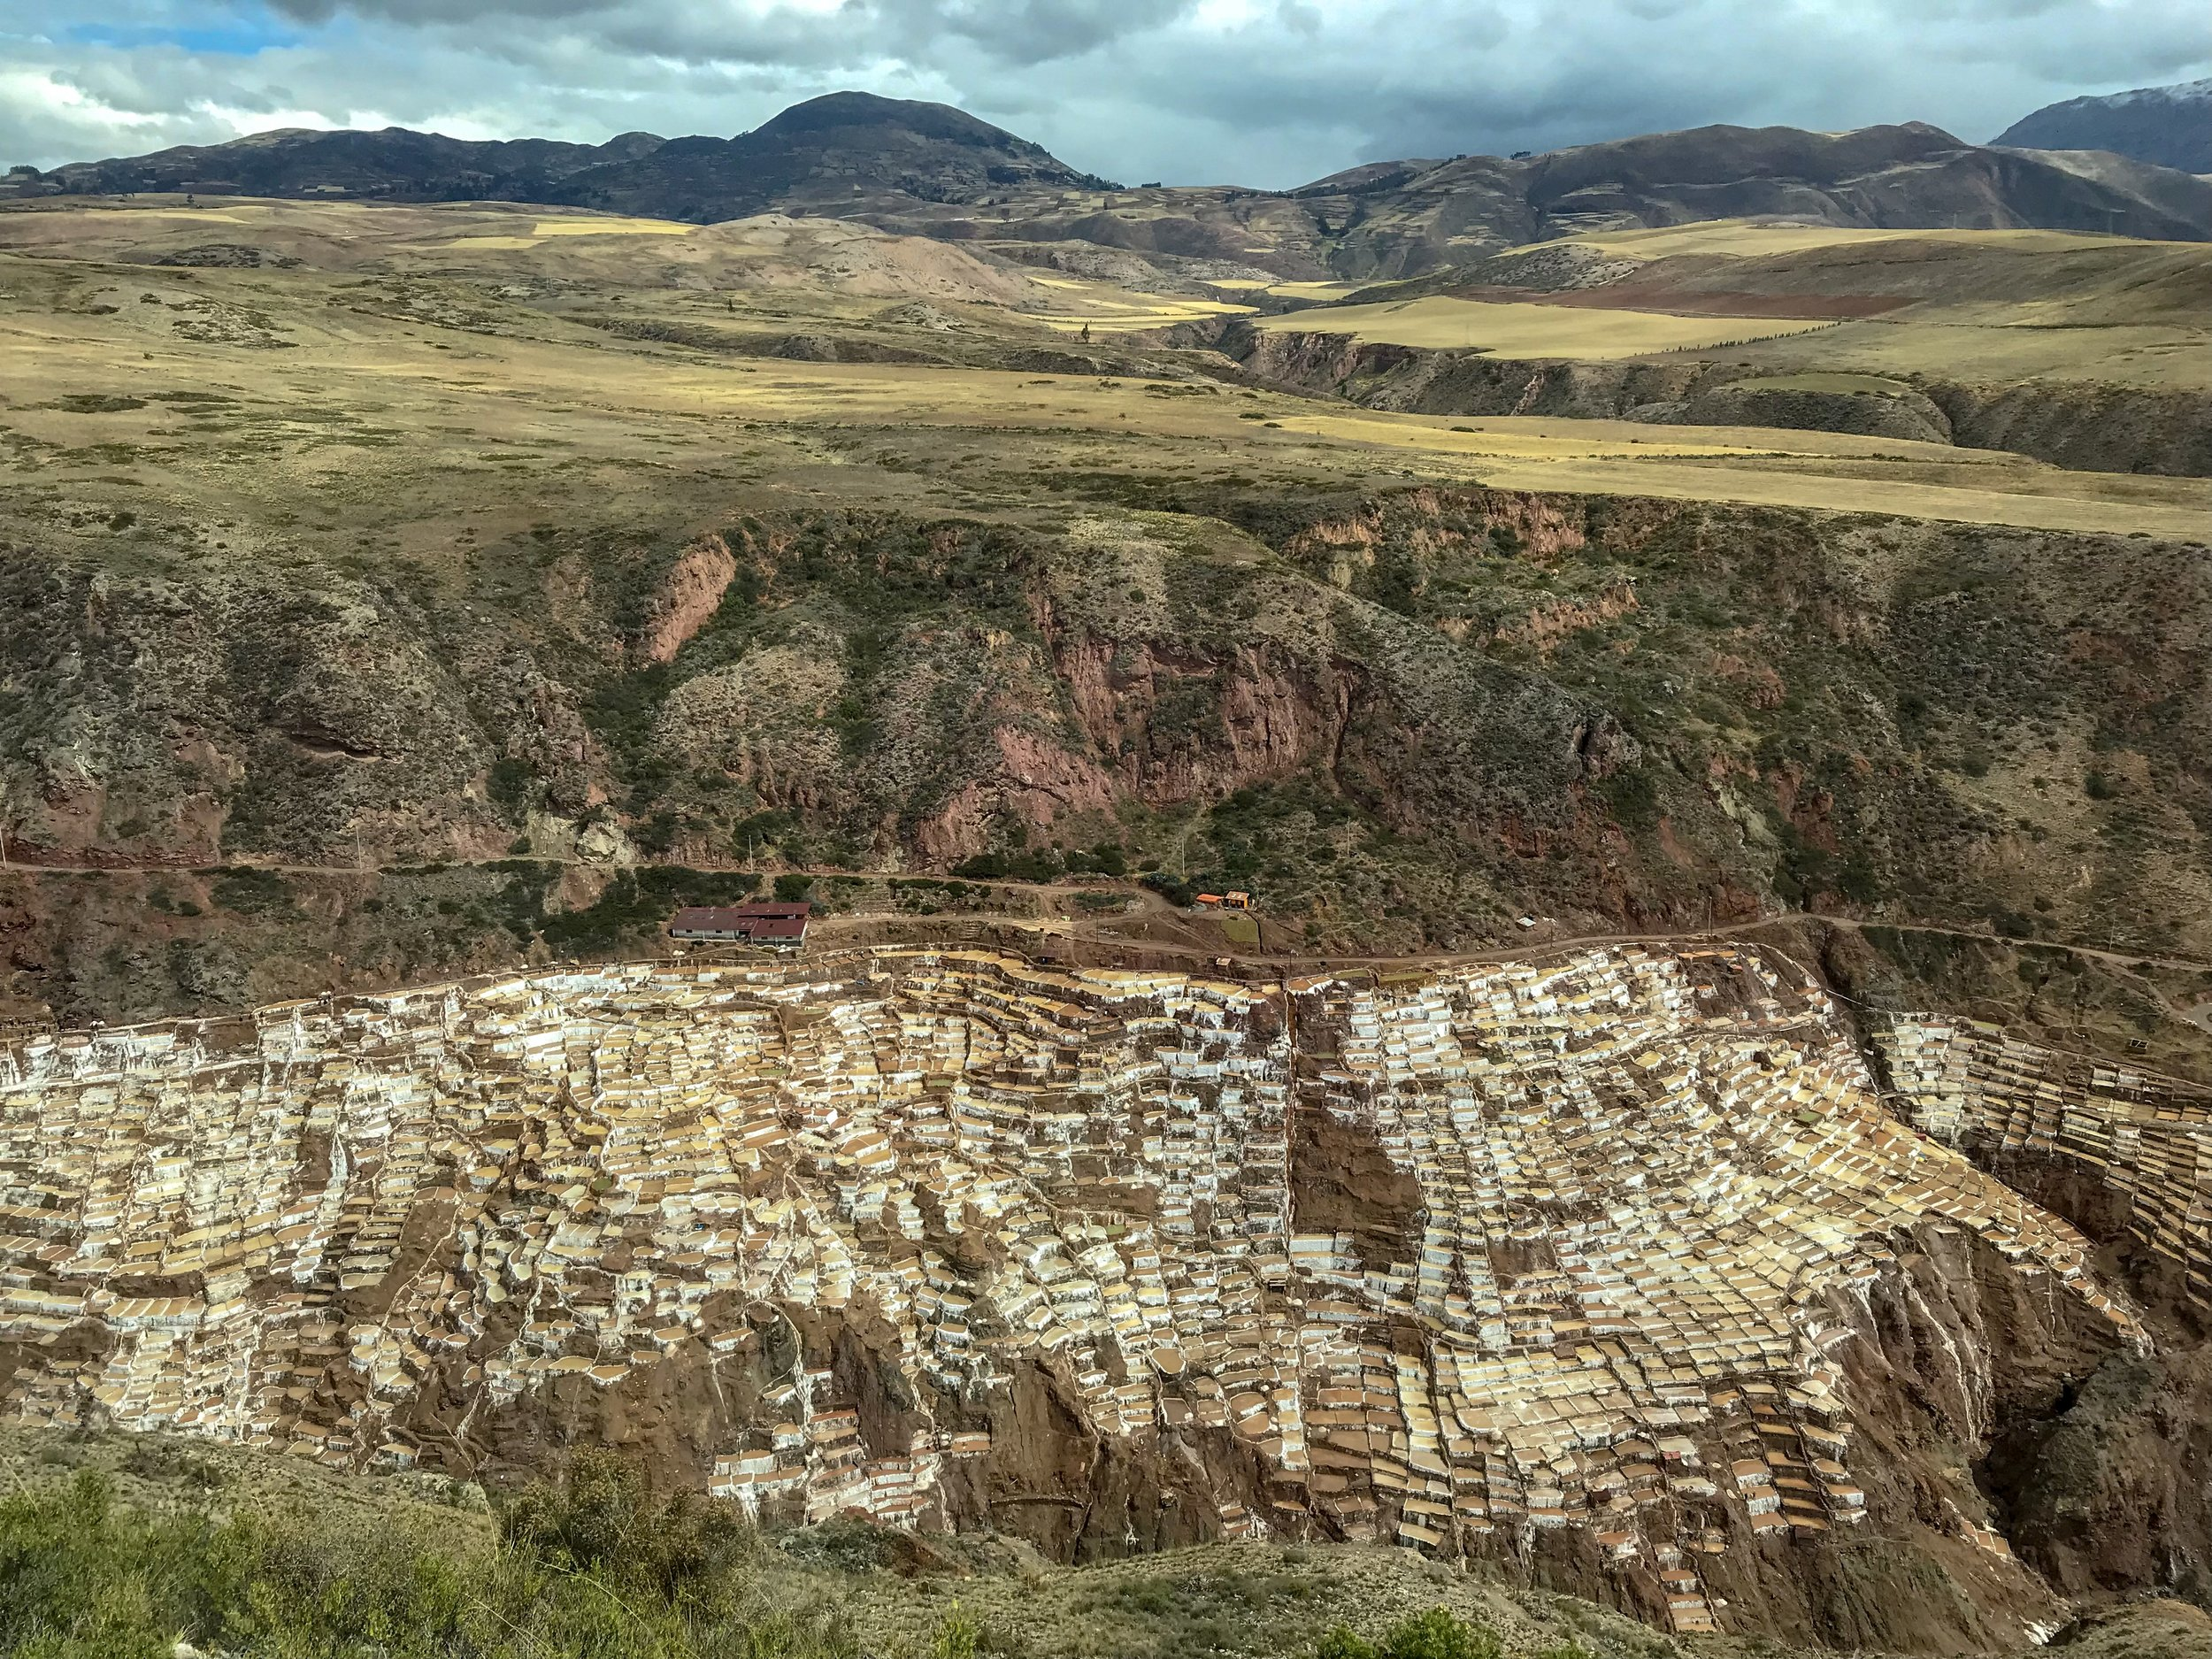 View of Salineras de Maras